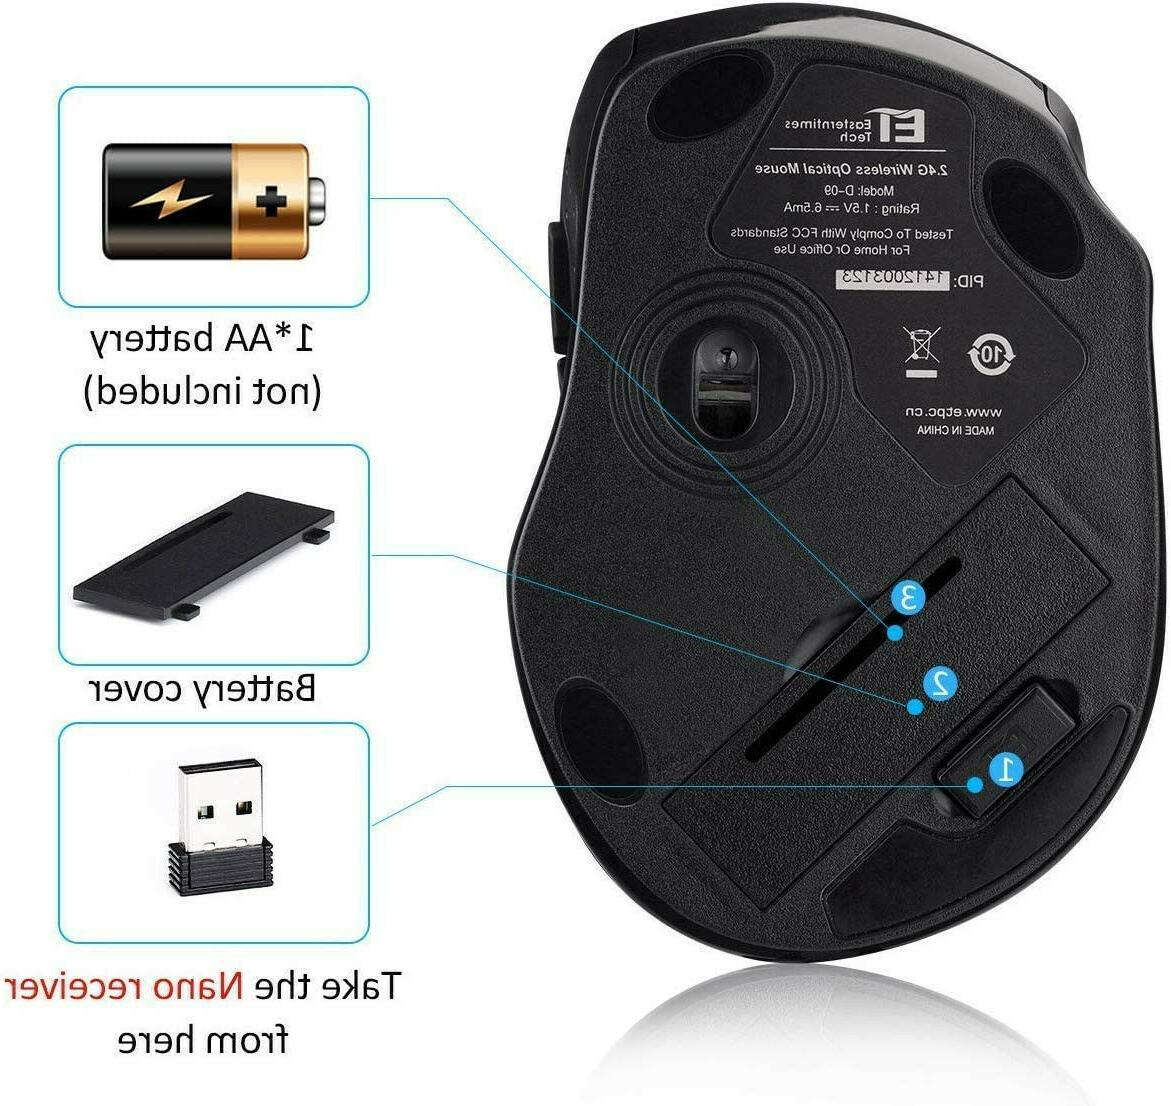 New Wireless Optical DPI, 6 Buttons